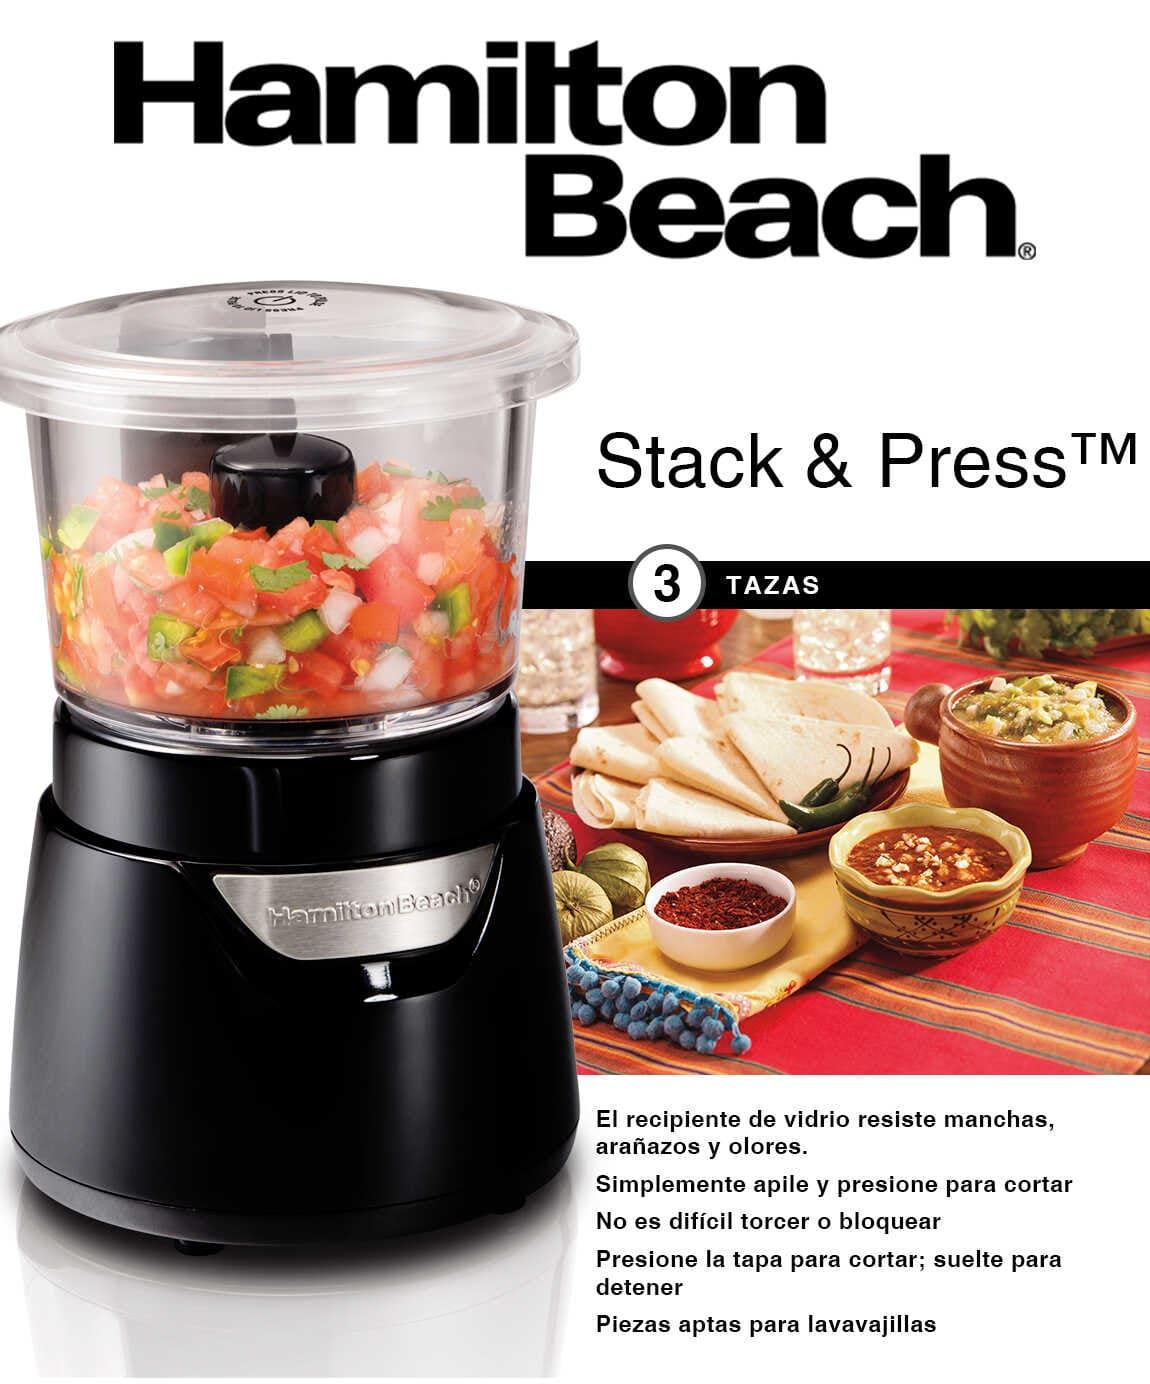 Stack and press 3 tazas